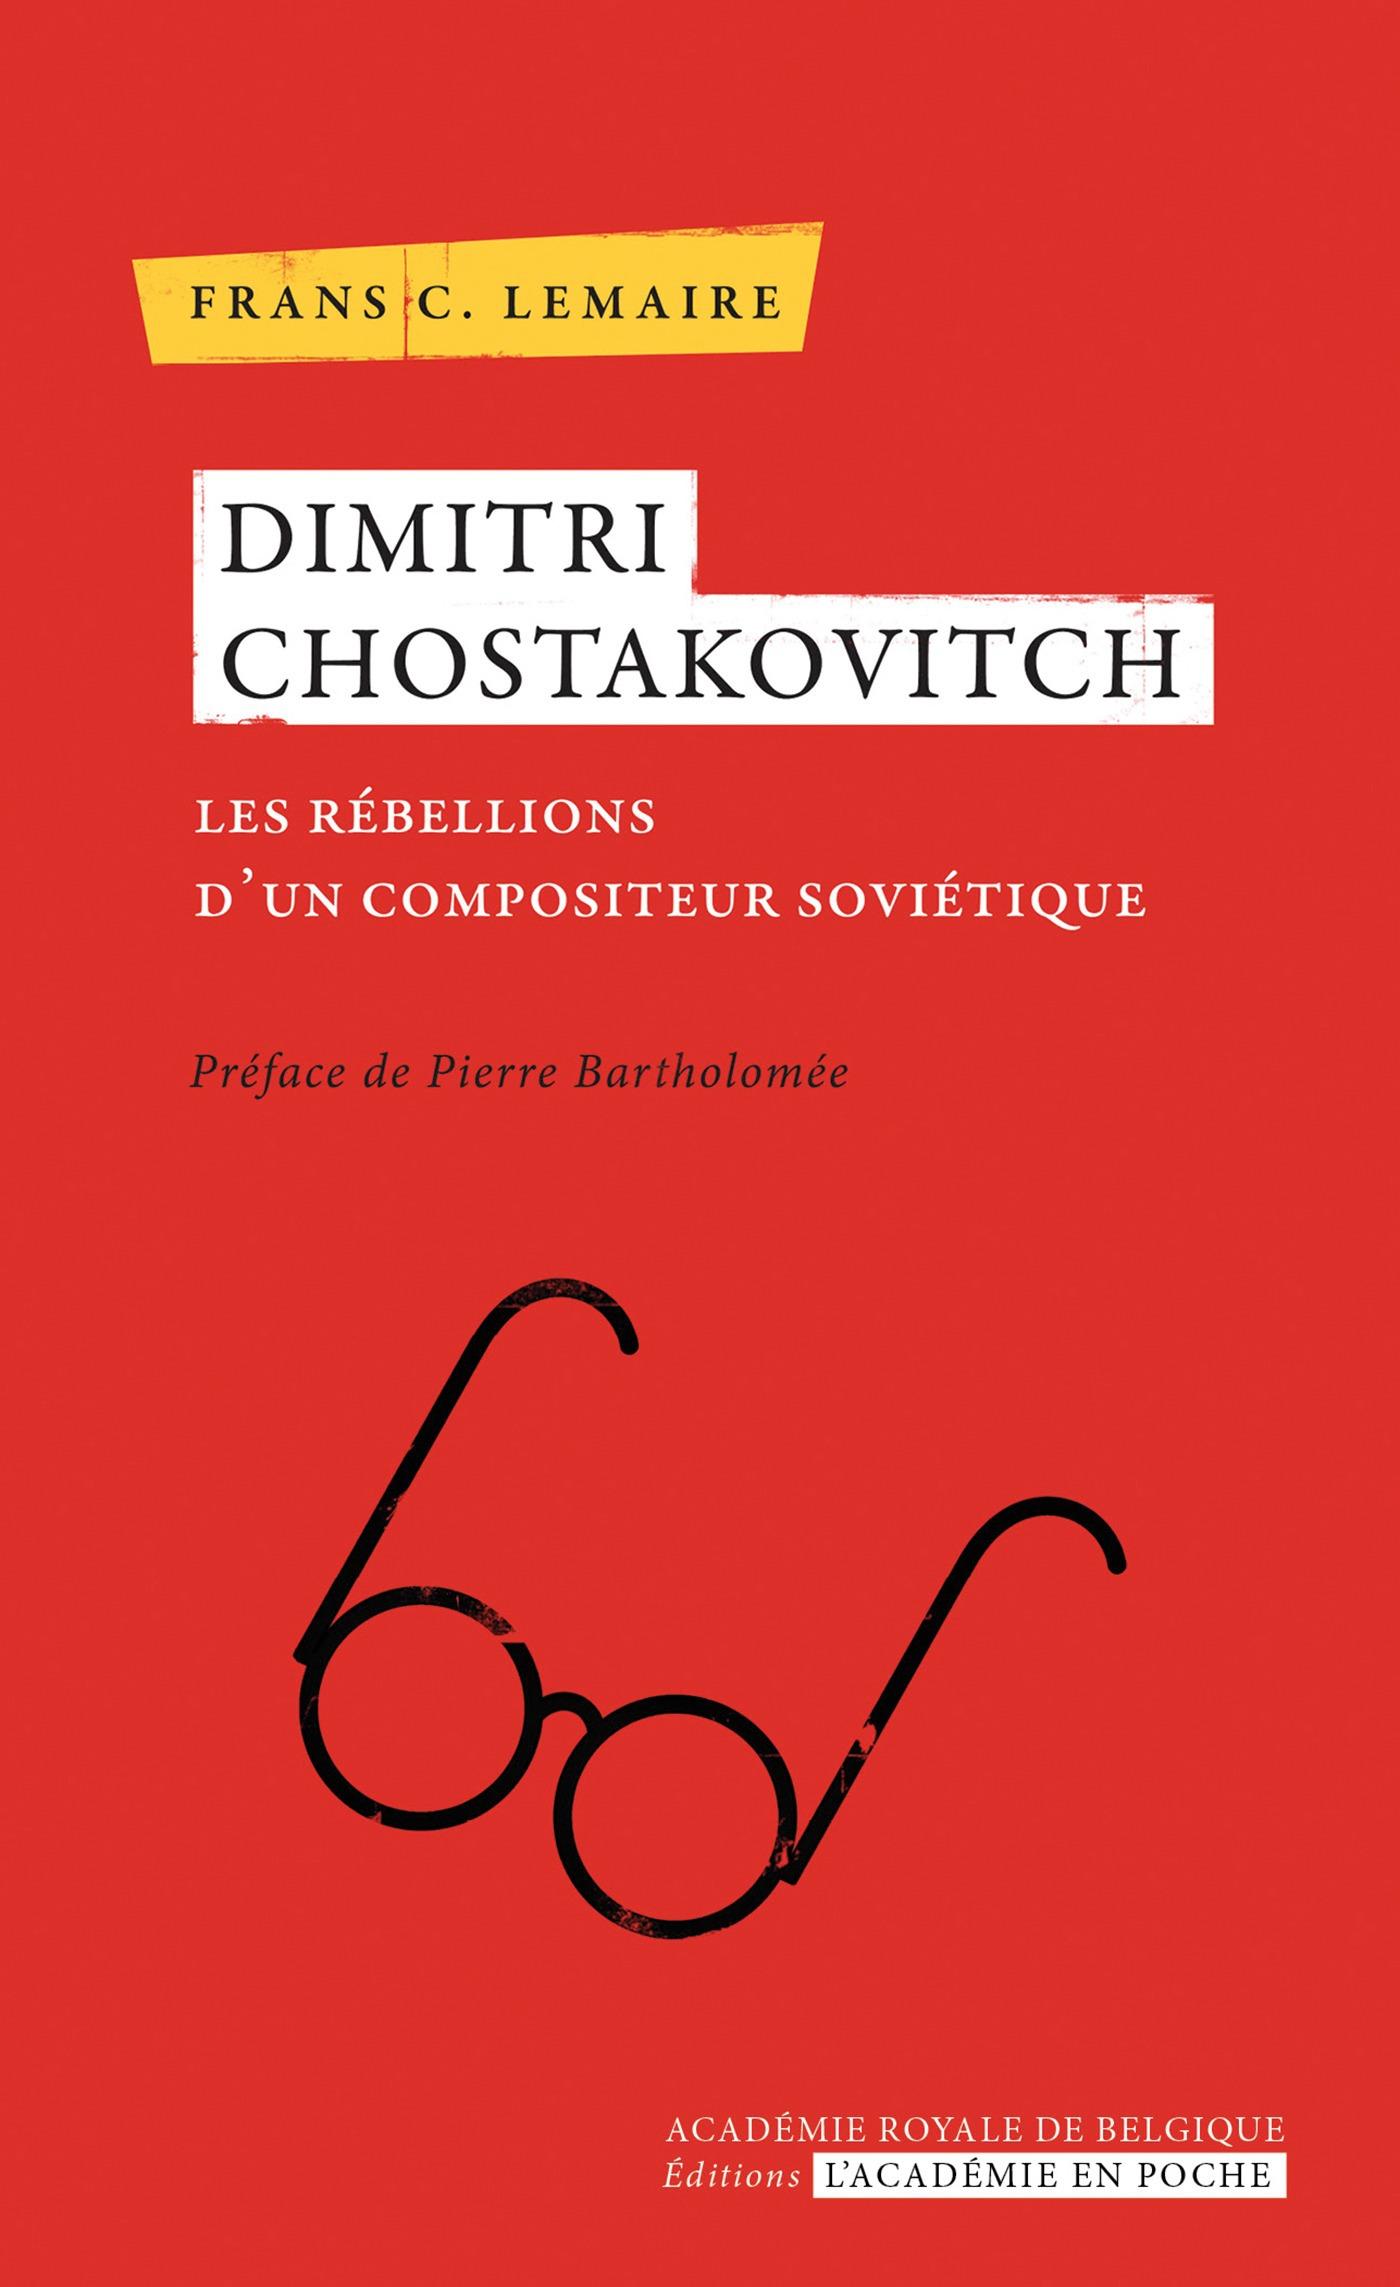 Dimitri Chostakovitch (1906-1975)